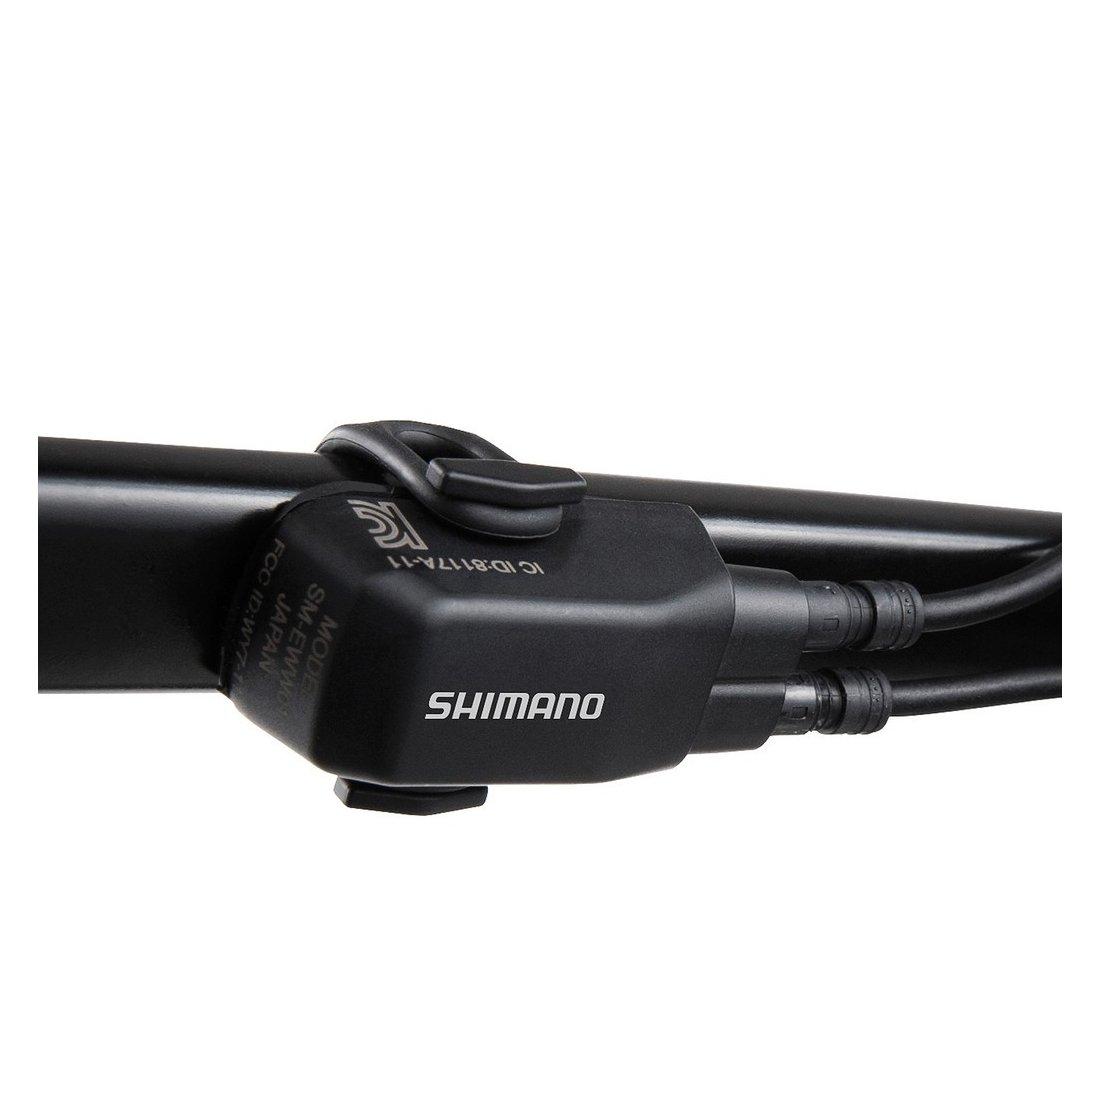 SHIMANO D-Fly Di2 2Xetube T Transmisor, Unisex Adulto, Azul, Talla Ú nica Talla Única EWWU101